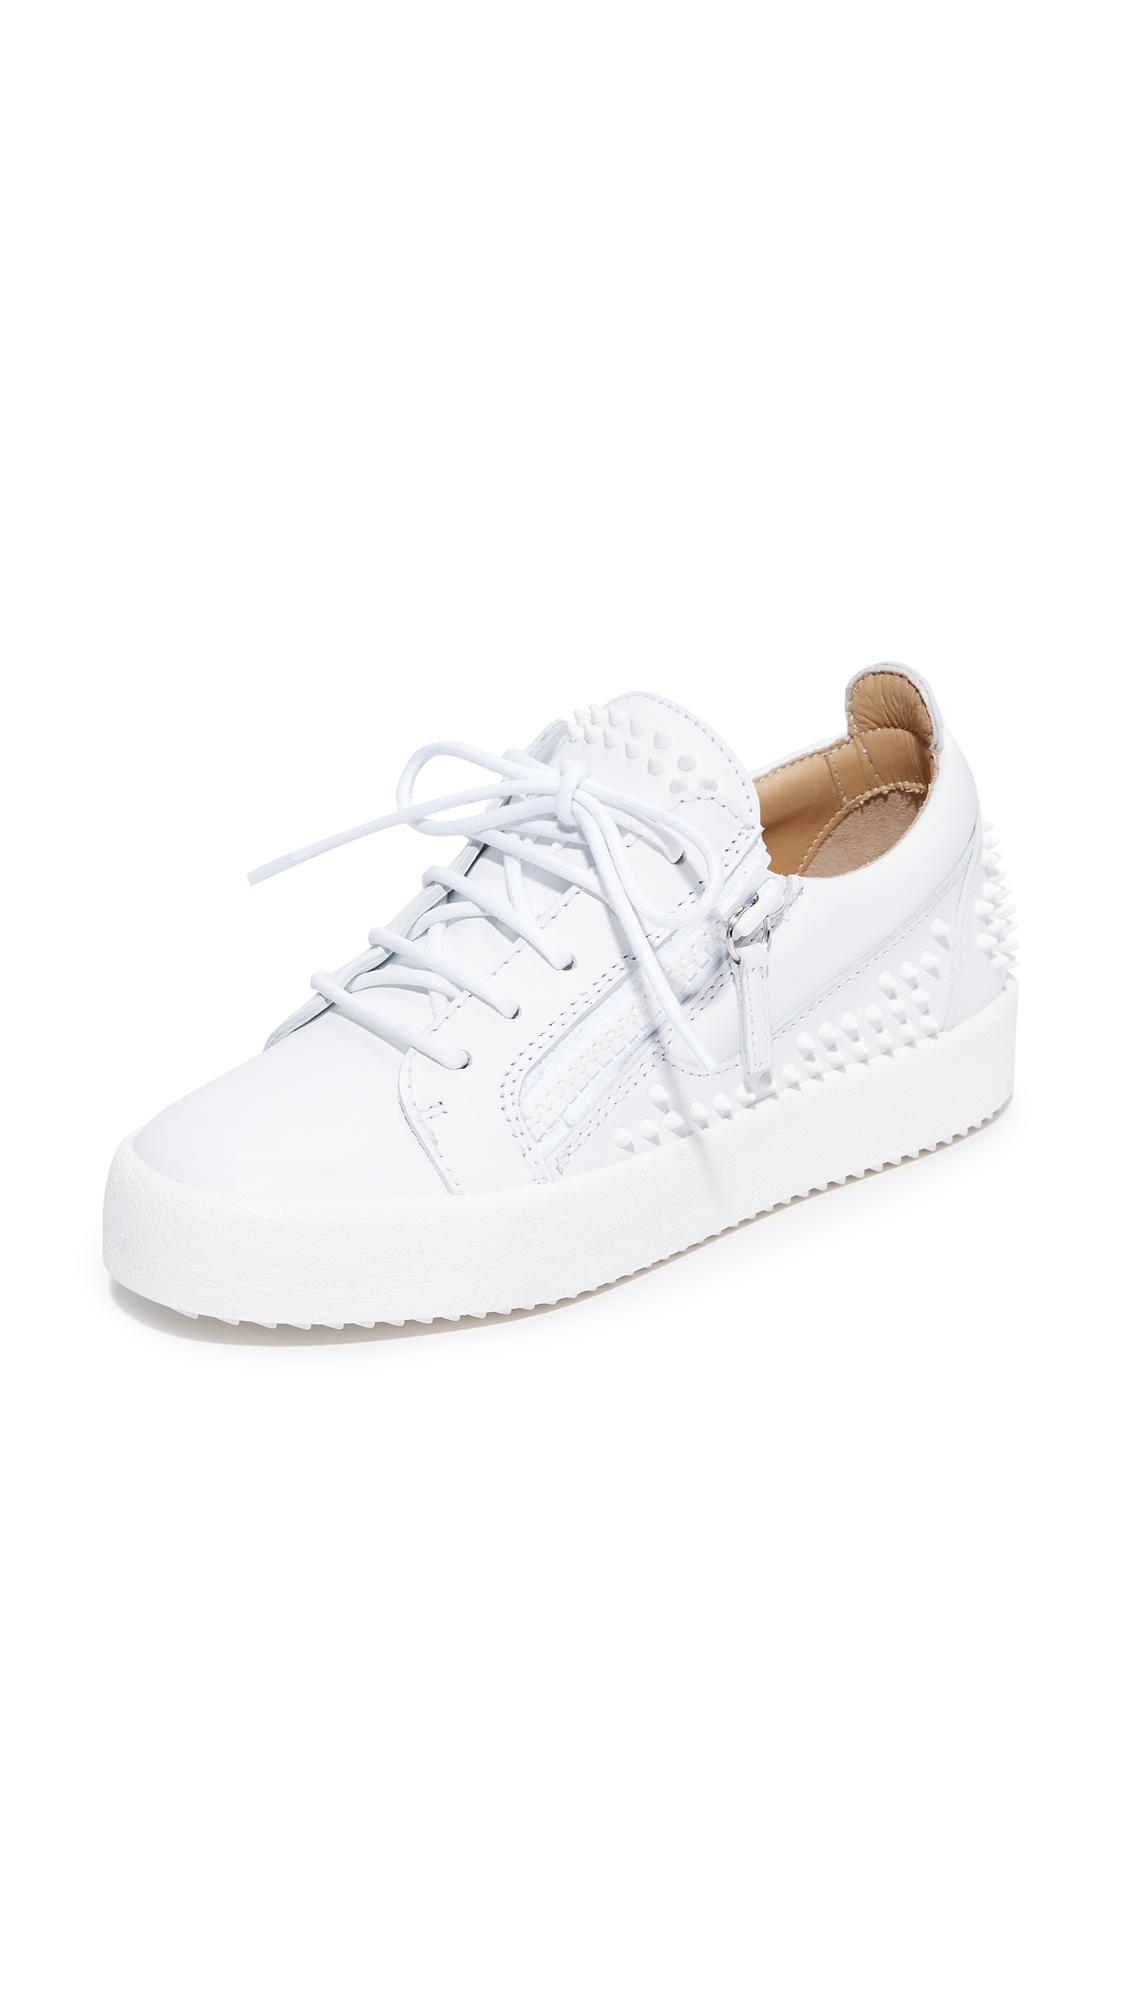 Giuseppe Zanotti Maylondonsc Sneakers - White